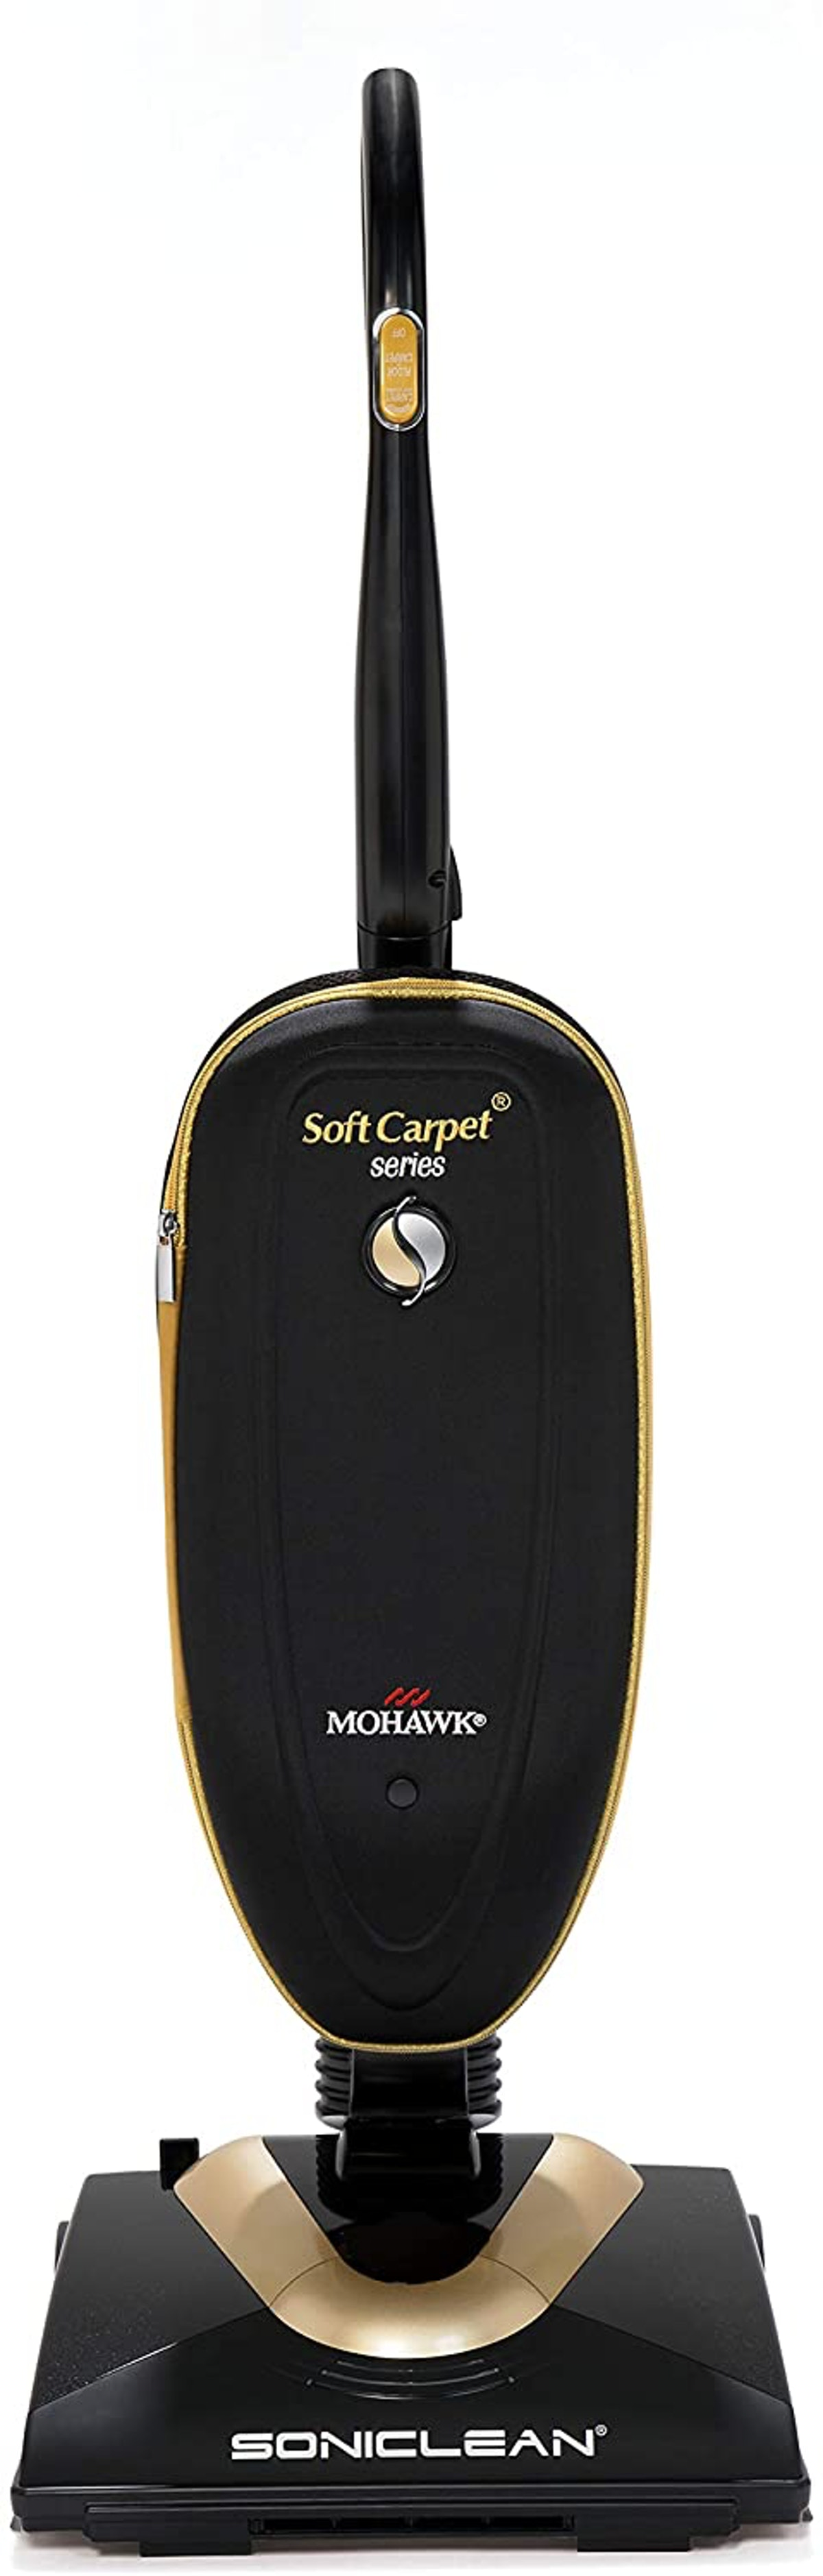 Soniclean Soft Carpet Upright Vacuum Cleaner